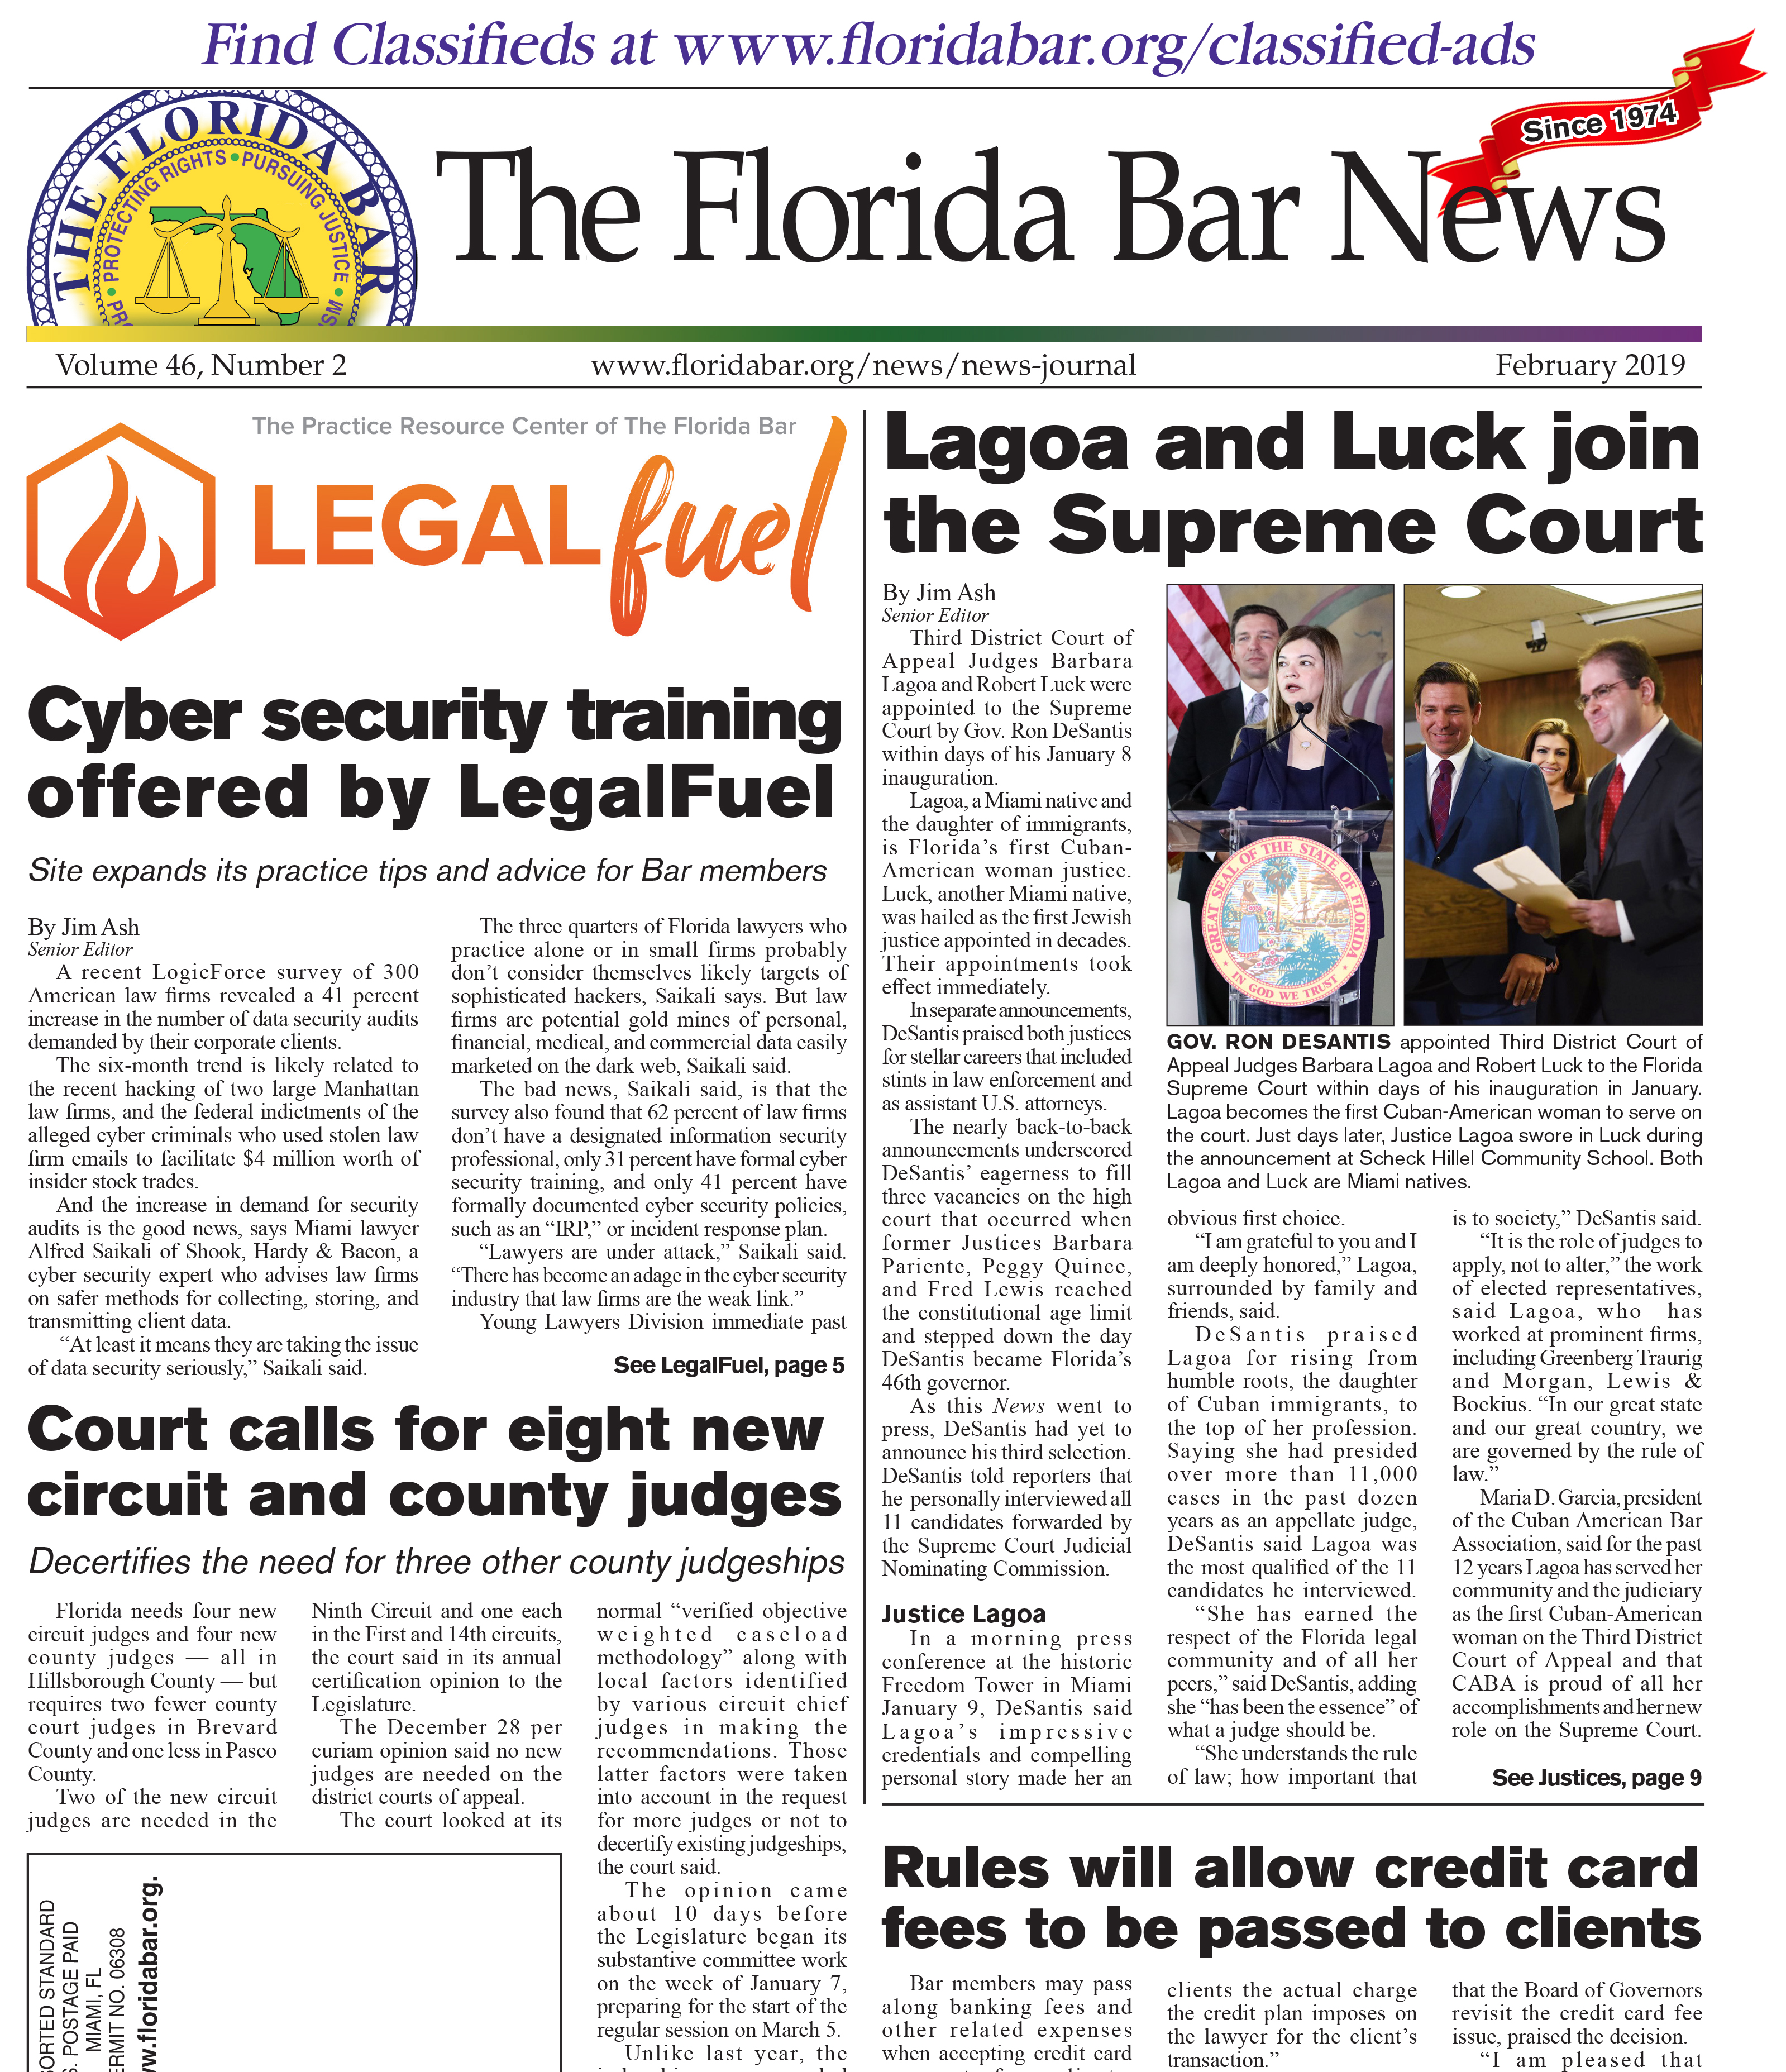 The Florida Bar News February 2019 Cover